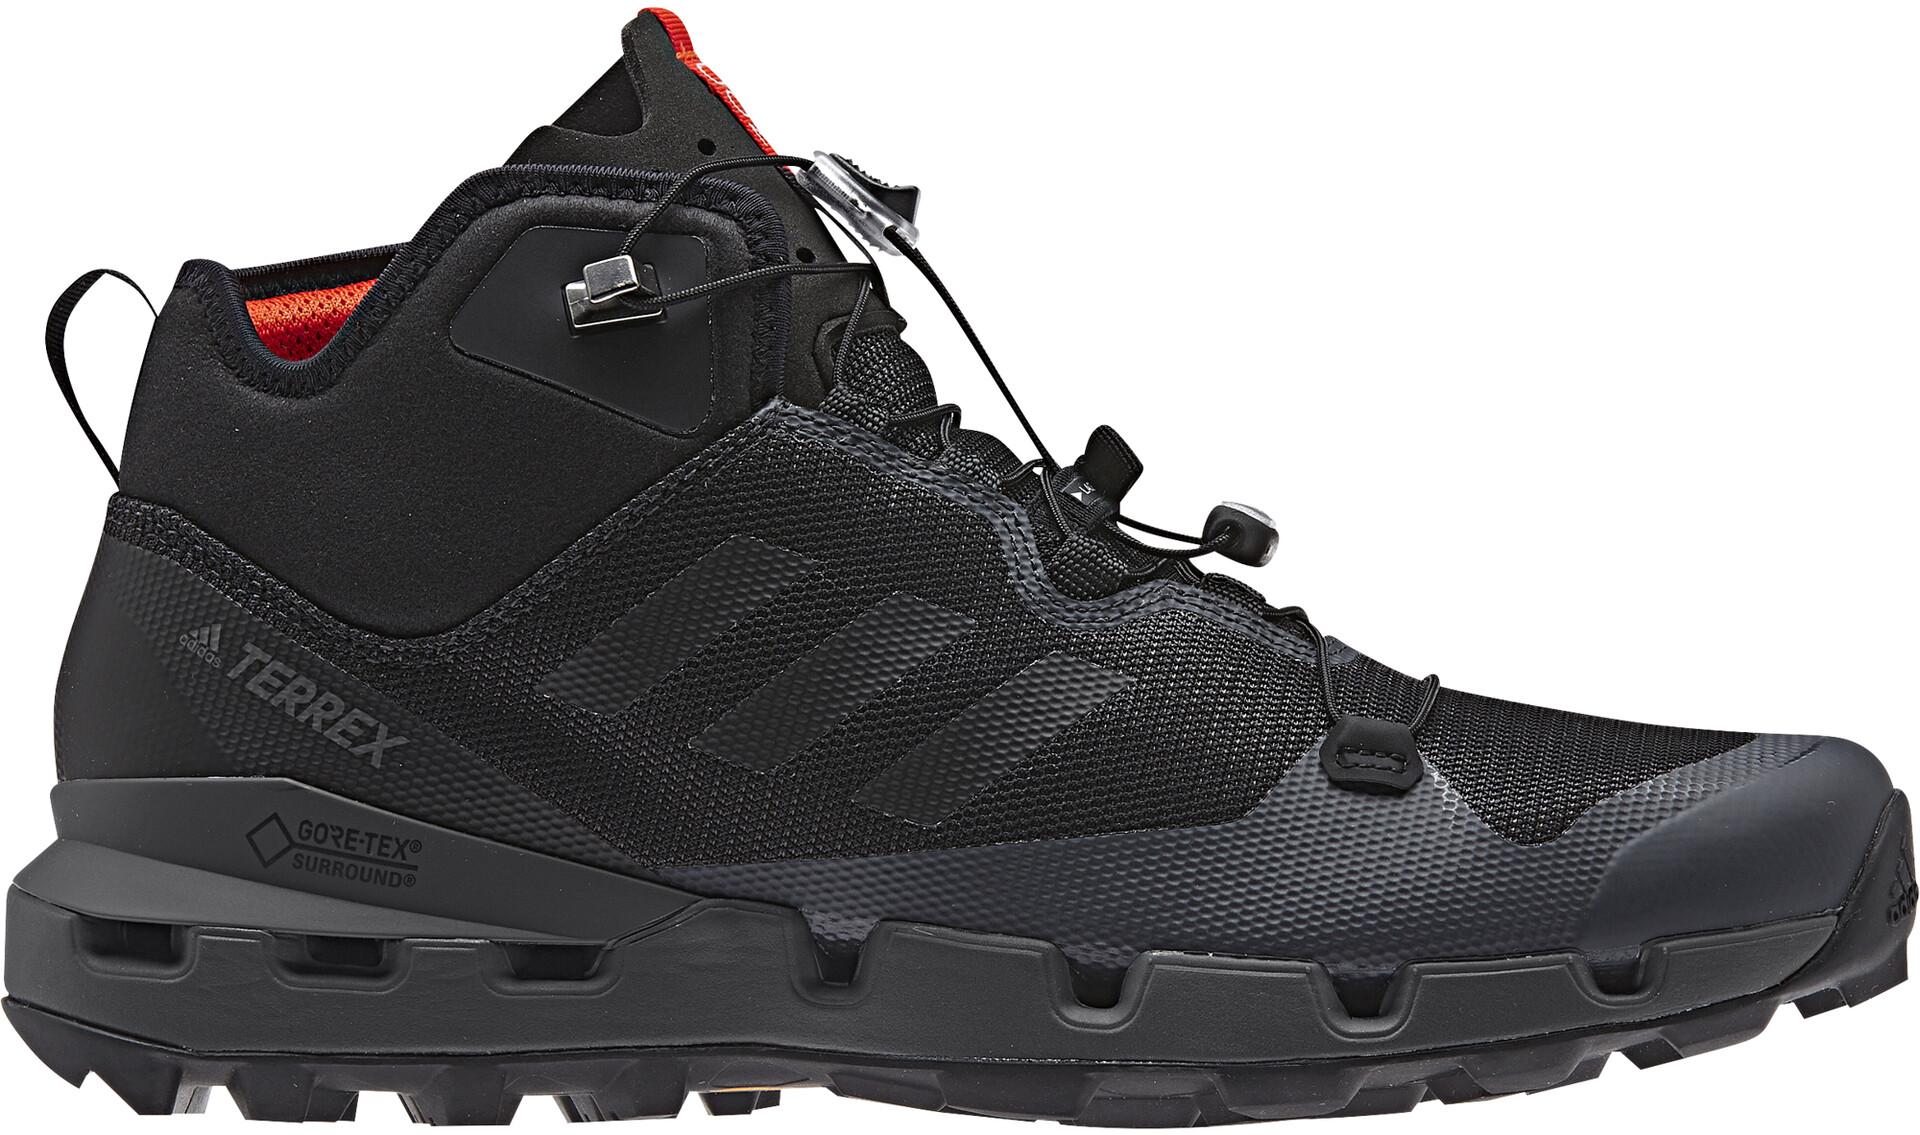 Men Terrex Gtx Fast Blackgresix Mid Shoes Carboncore Surround Adidas ebWH29YDIE